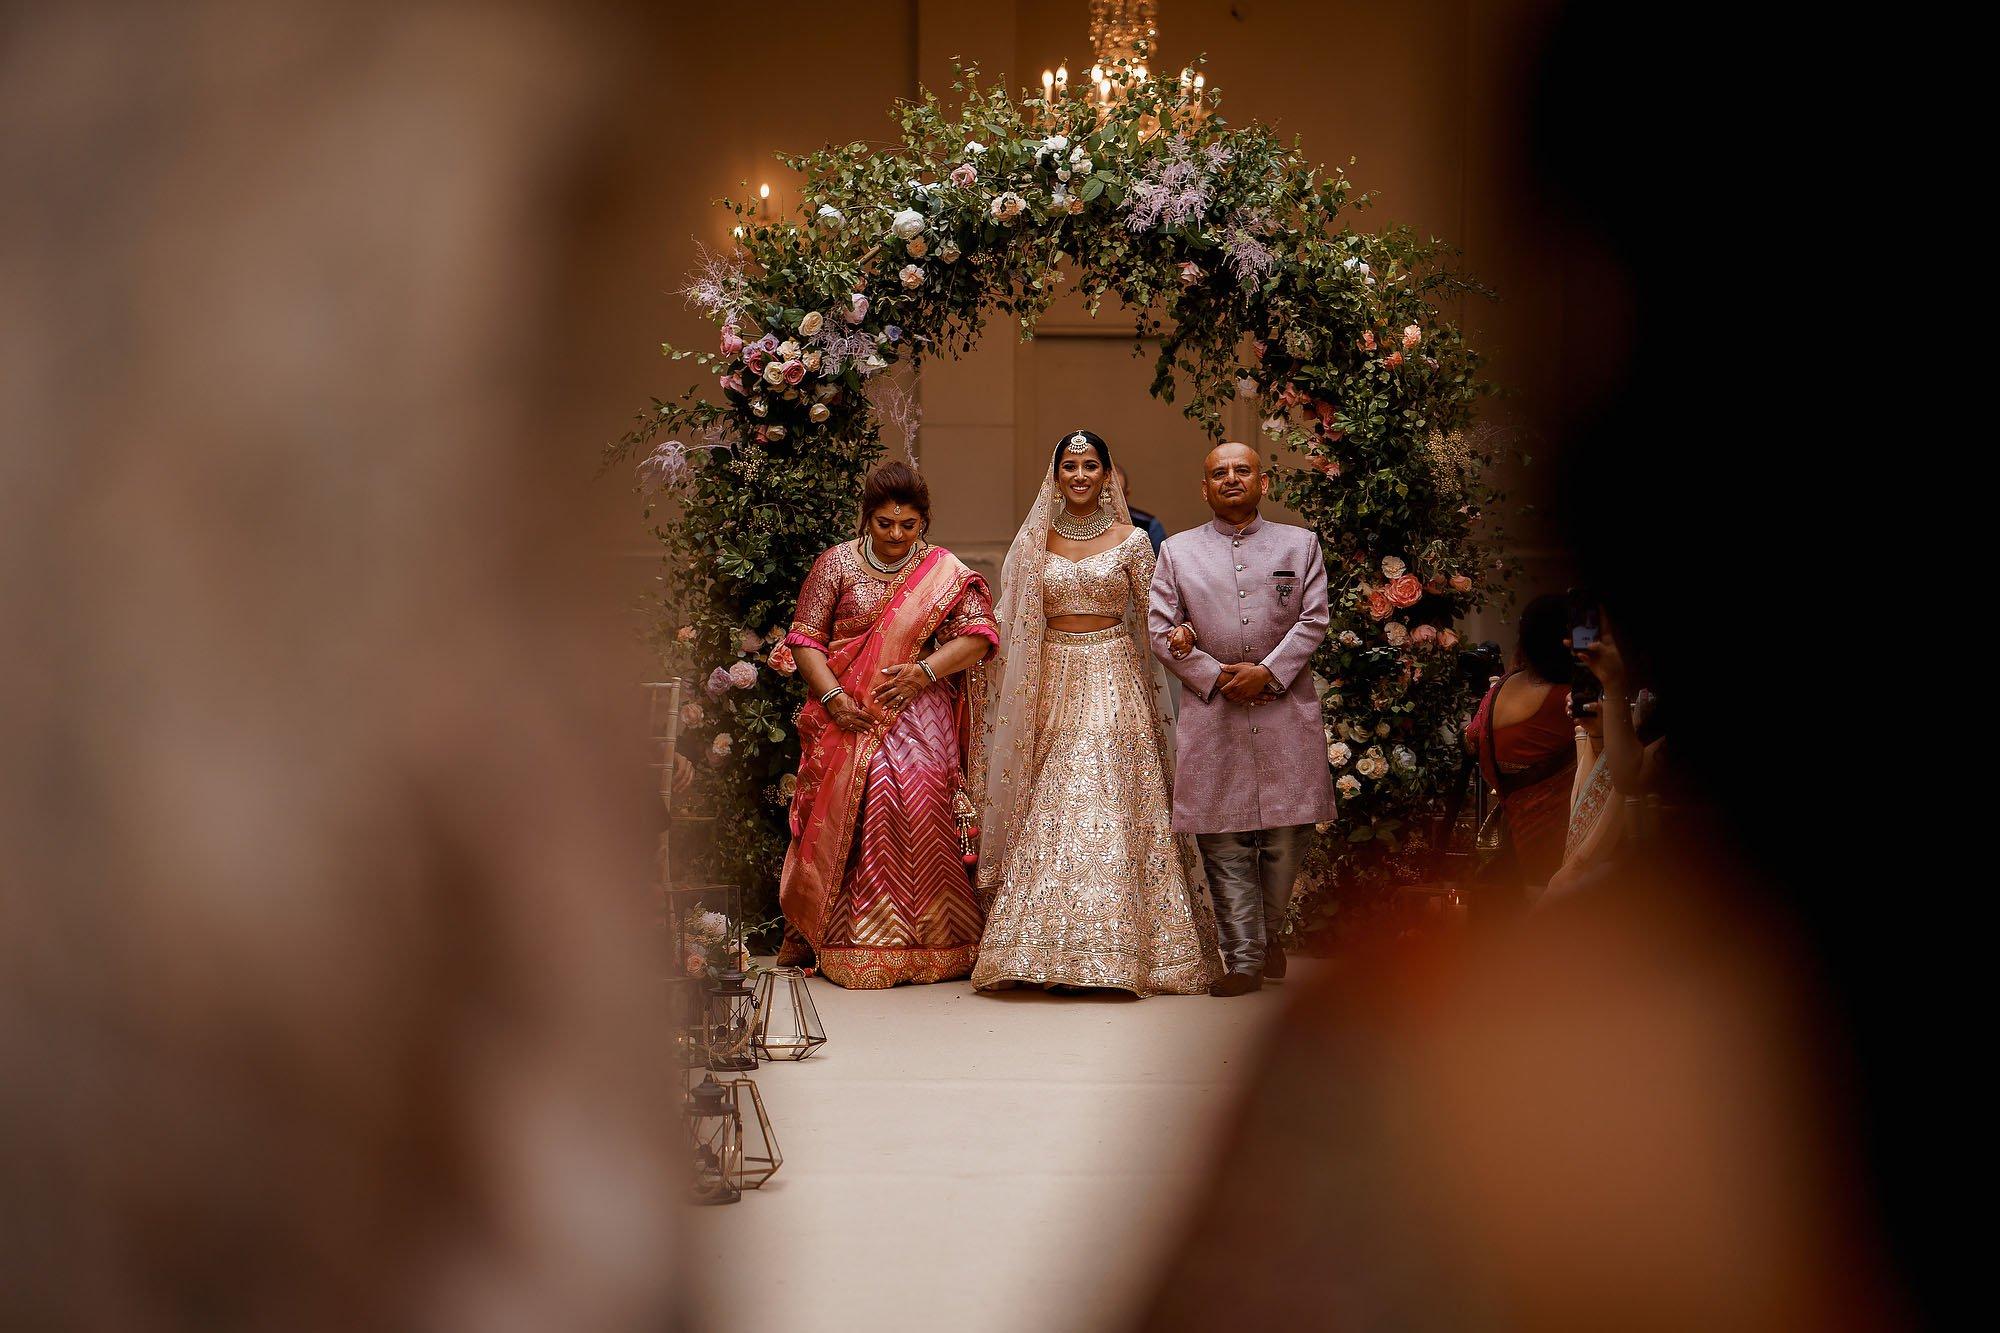 Beautiful offley place wedding photography